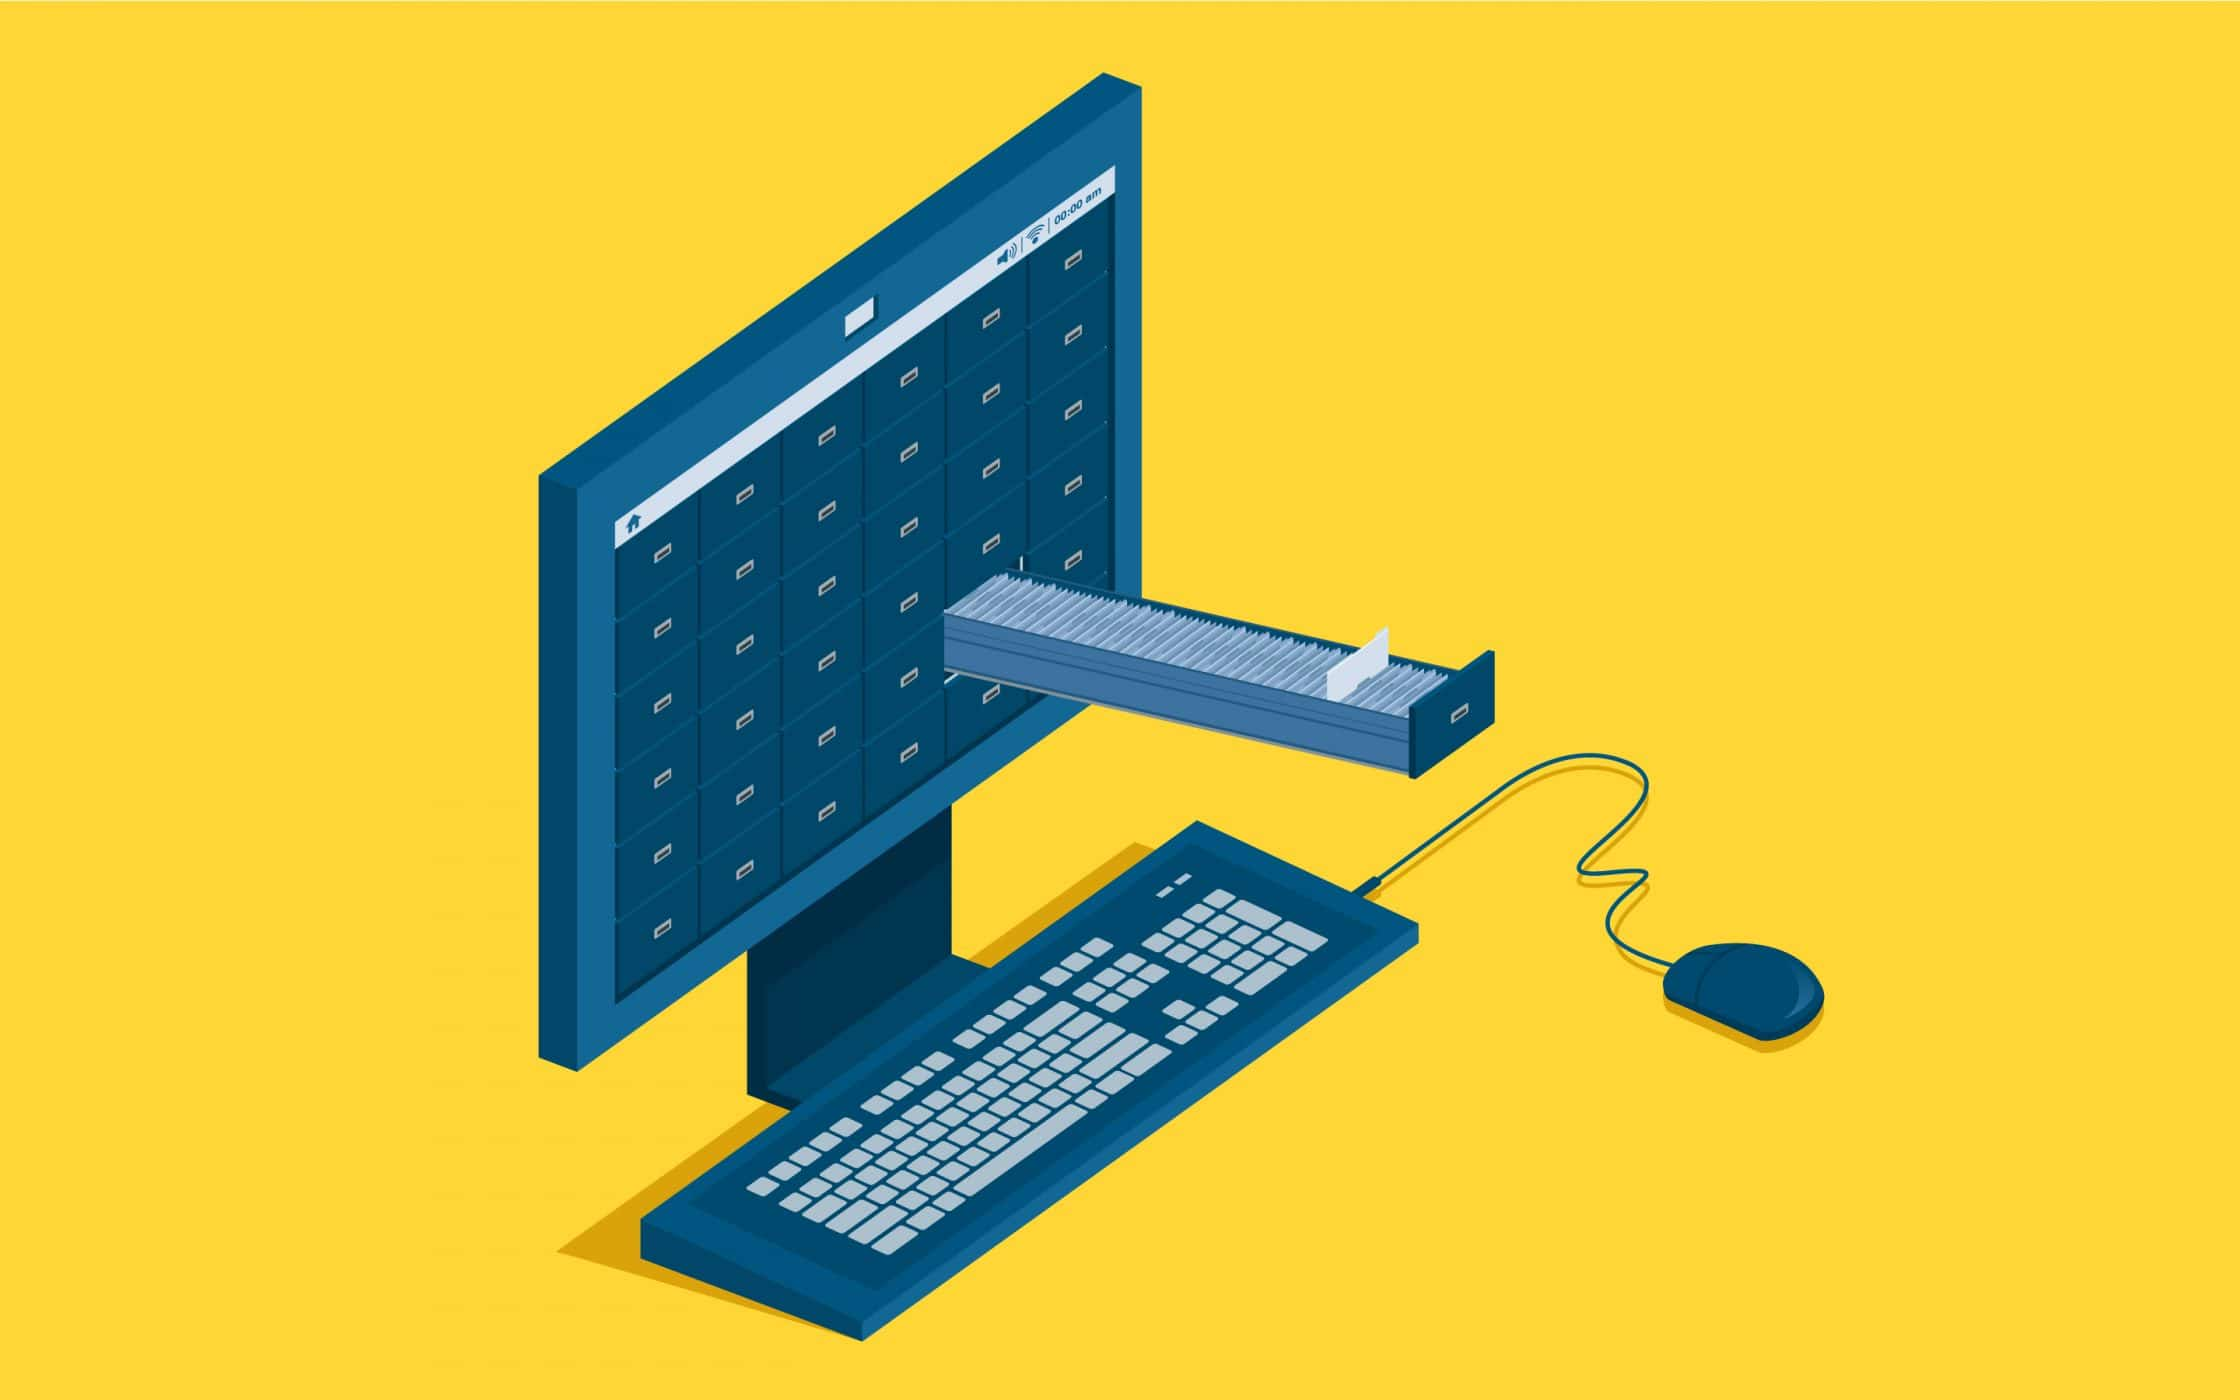 What Is A Swipe File